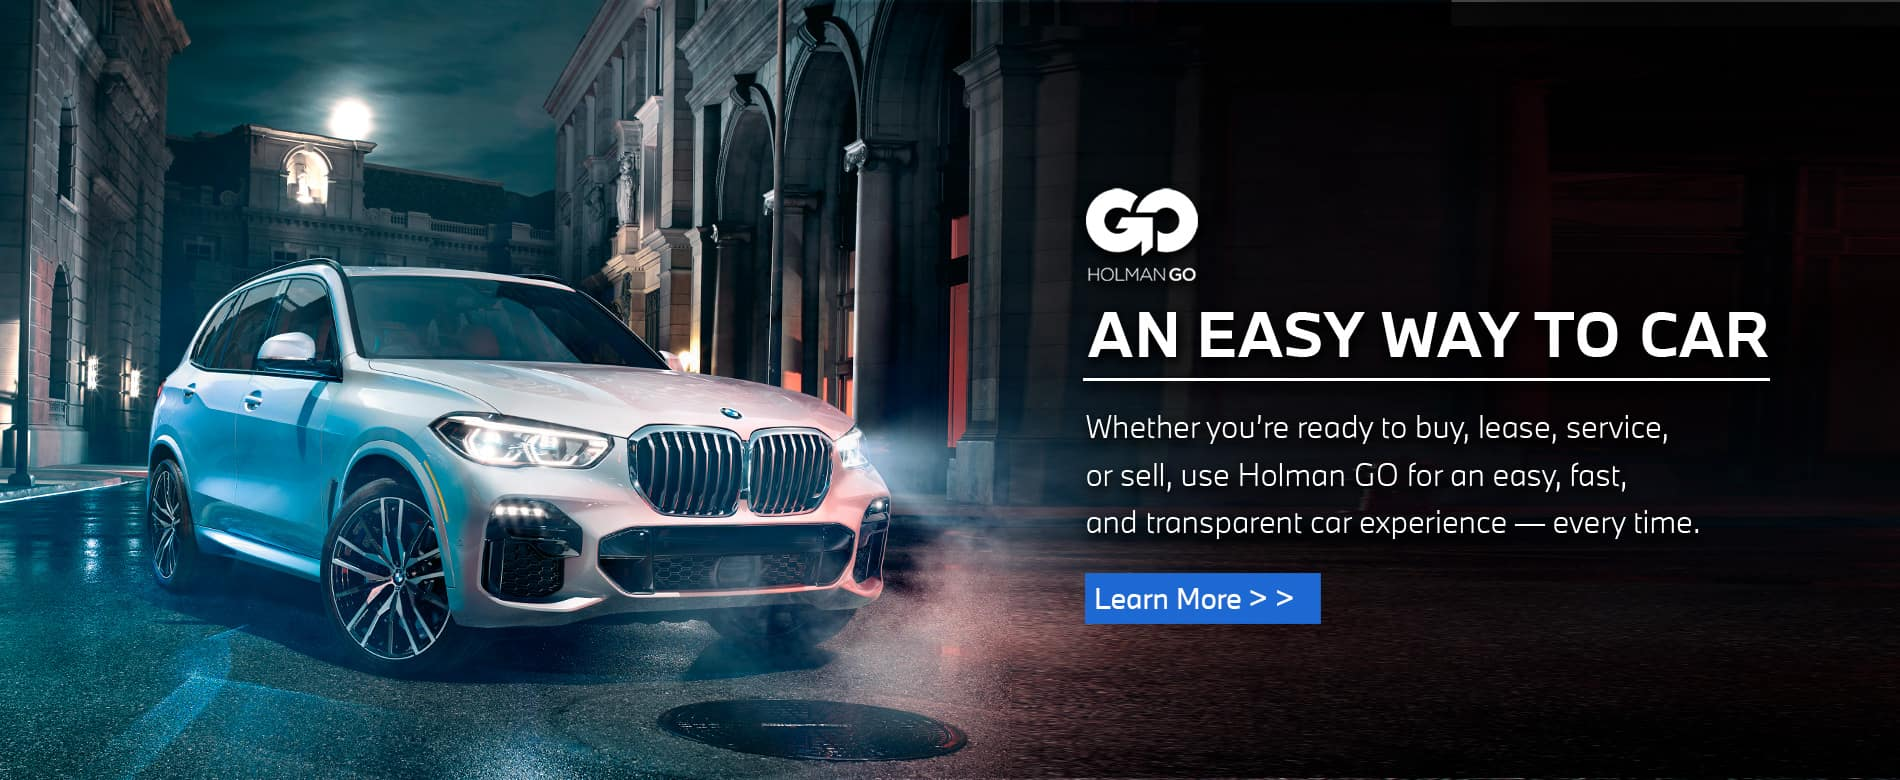 HolmanGO-BMW-DI-HomepageBanner (1)